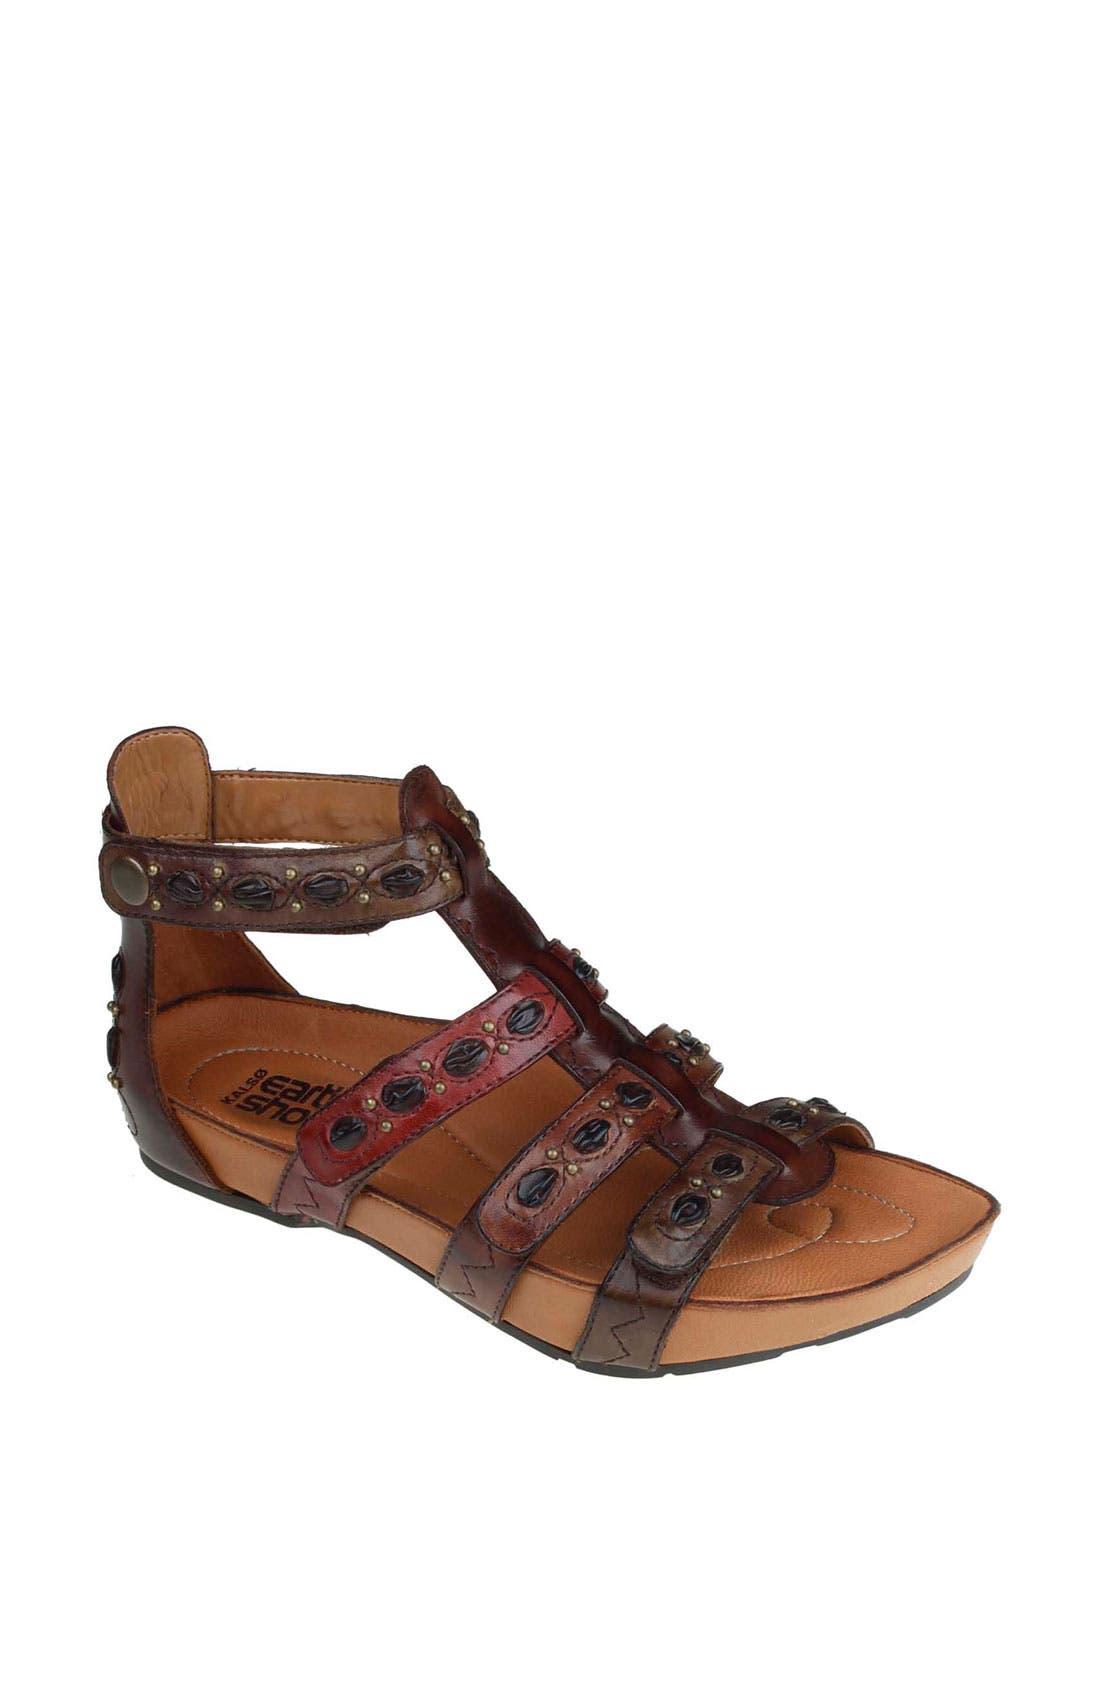 Main Image - Kalso Earth® 'Empire' Sandal